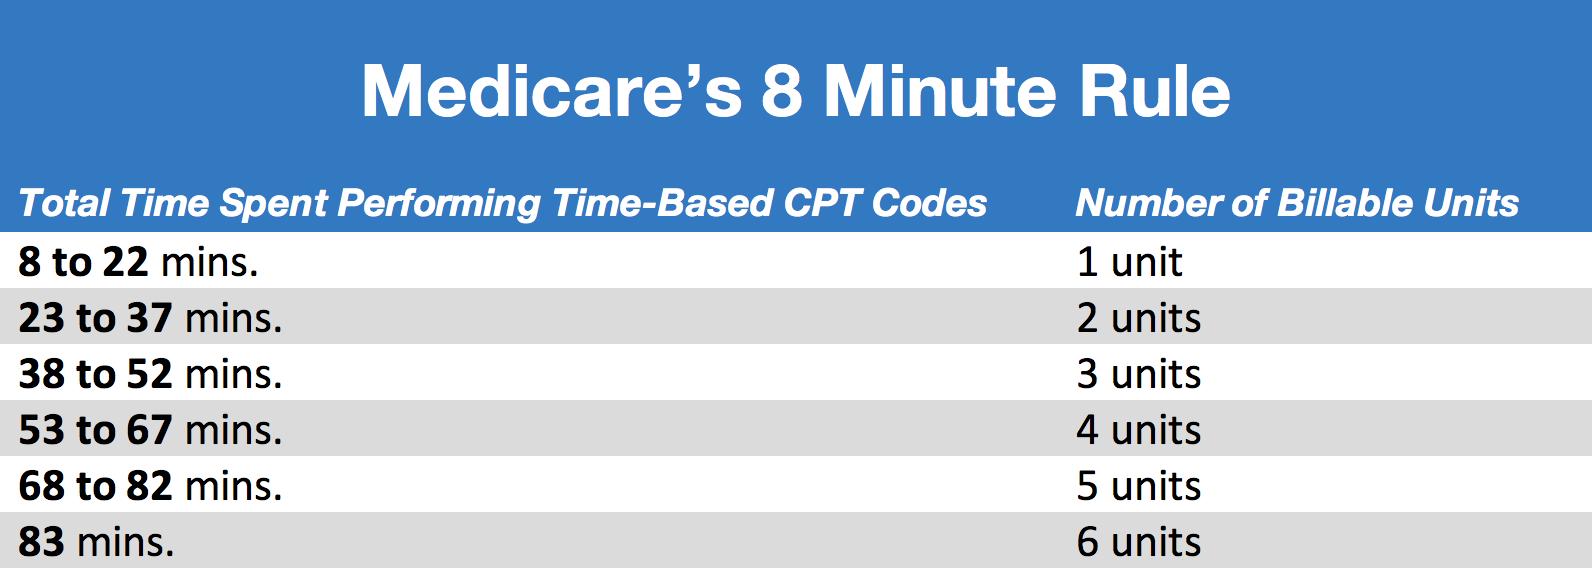 medicare-8-minute-rule